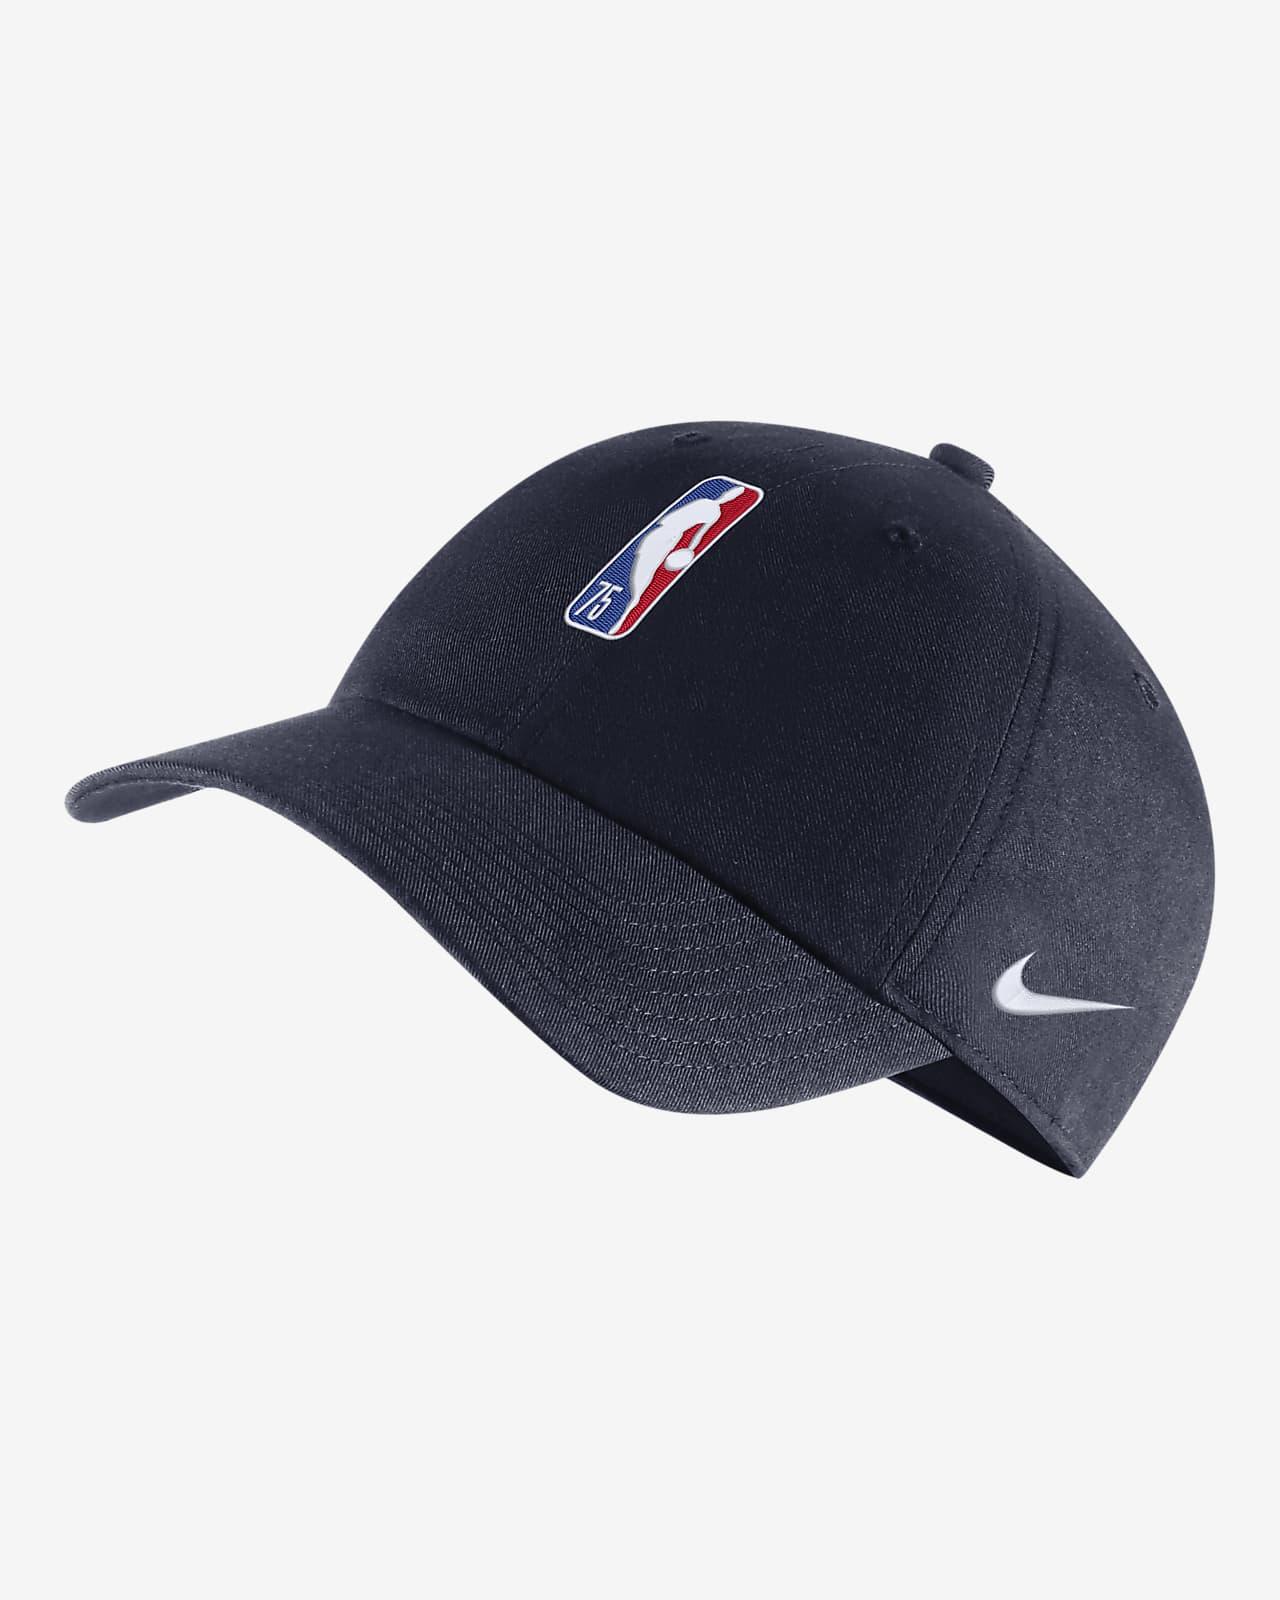 Team 31 Heritage86 Nike NBA 运动帽